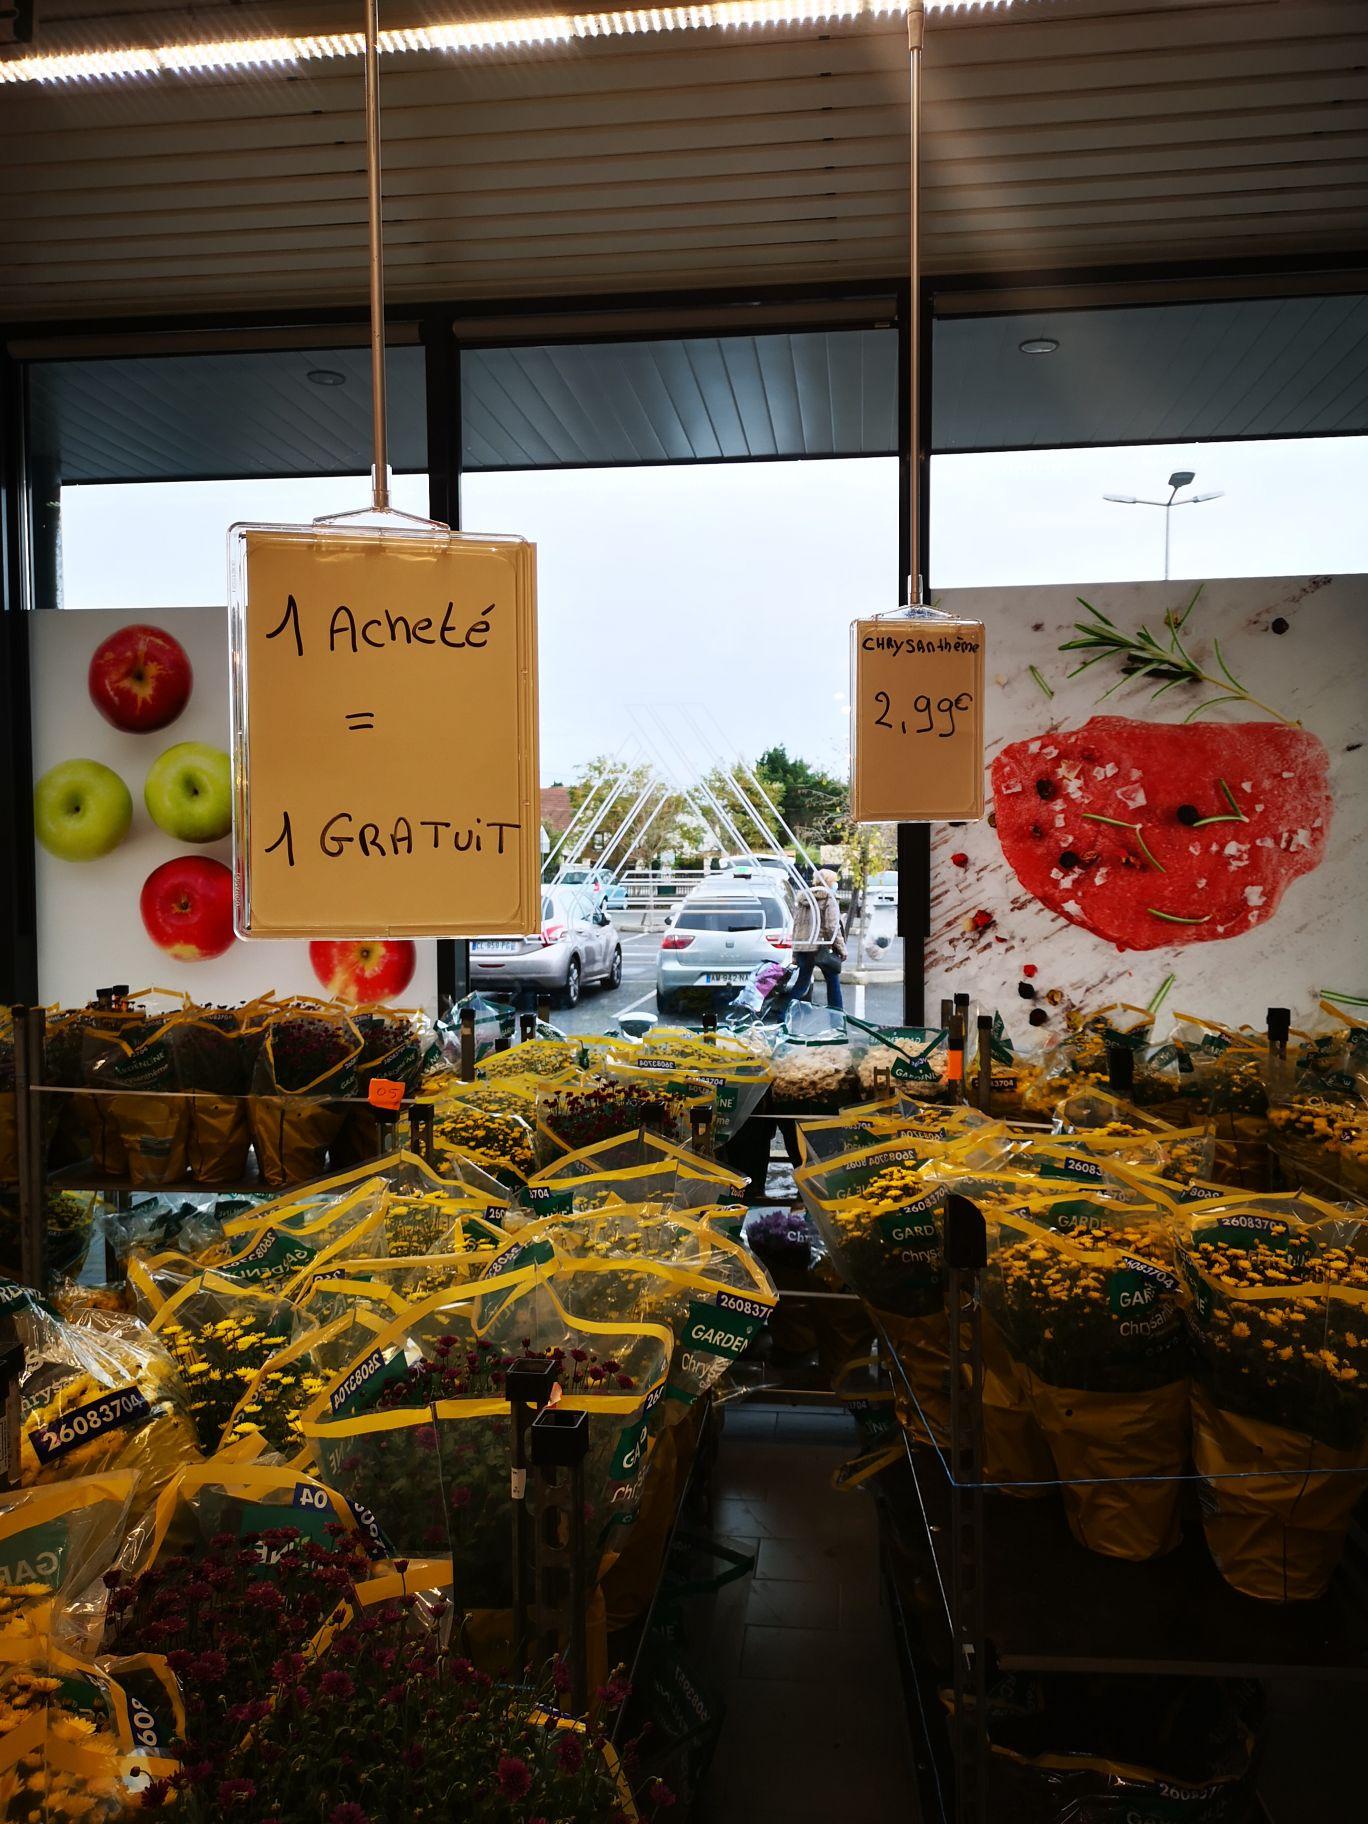 1 chrysanthème acheté = 1 offert - Breuil-le-Vert (60)